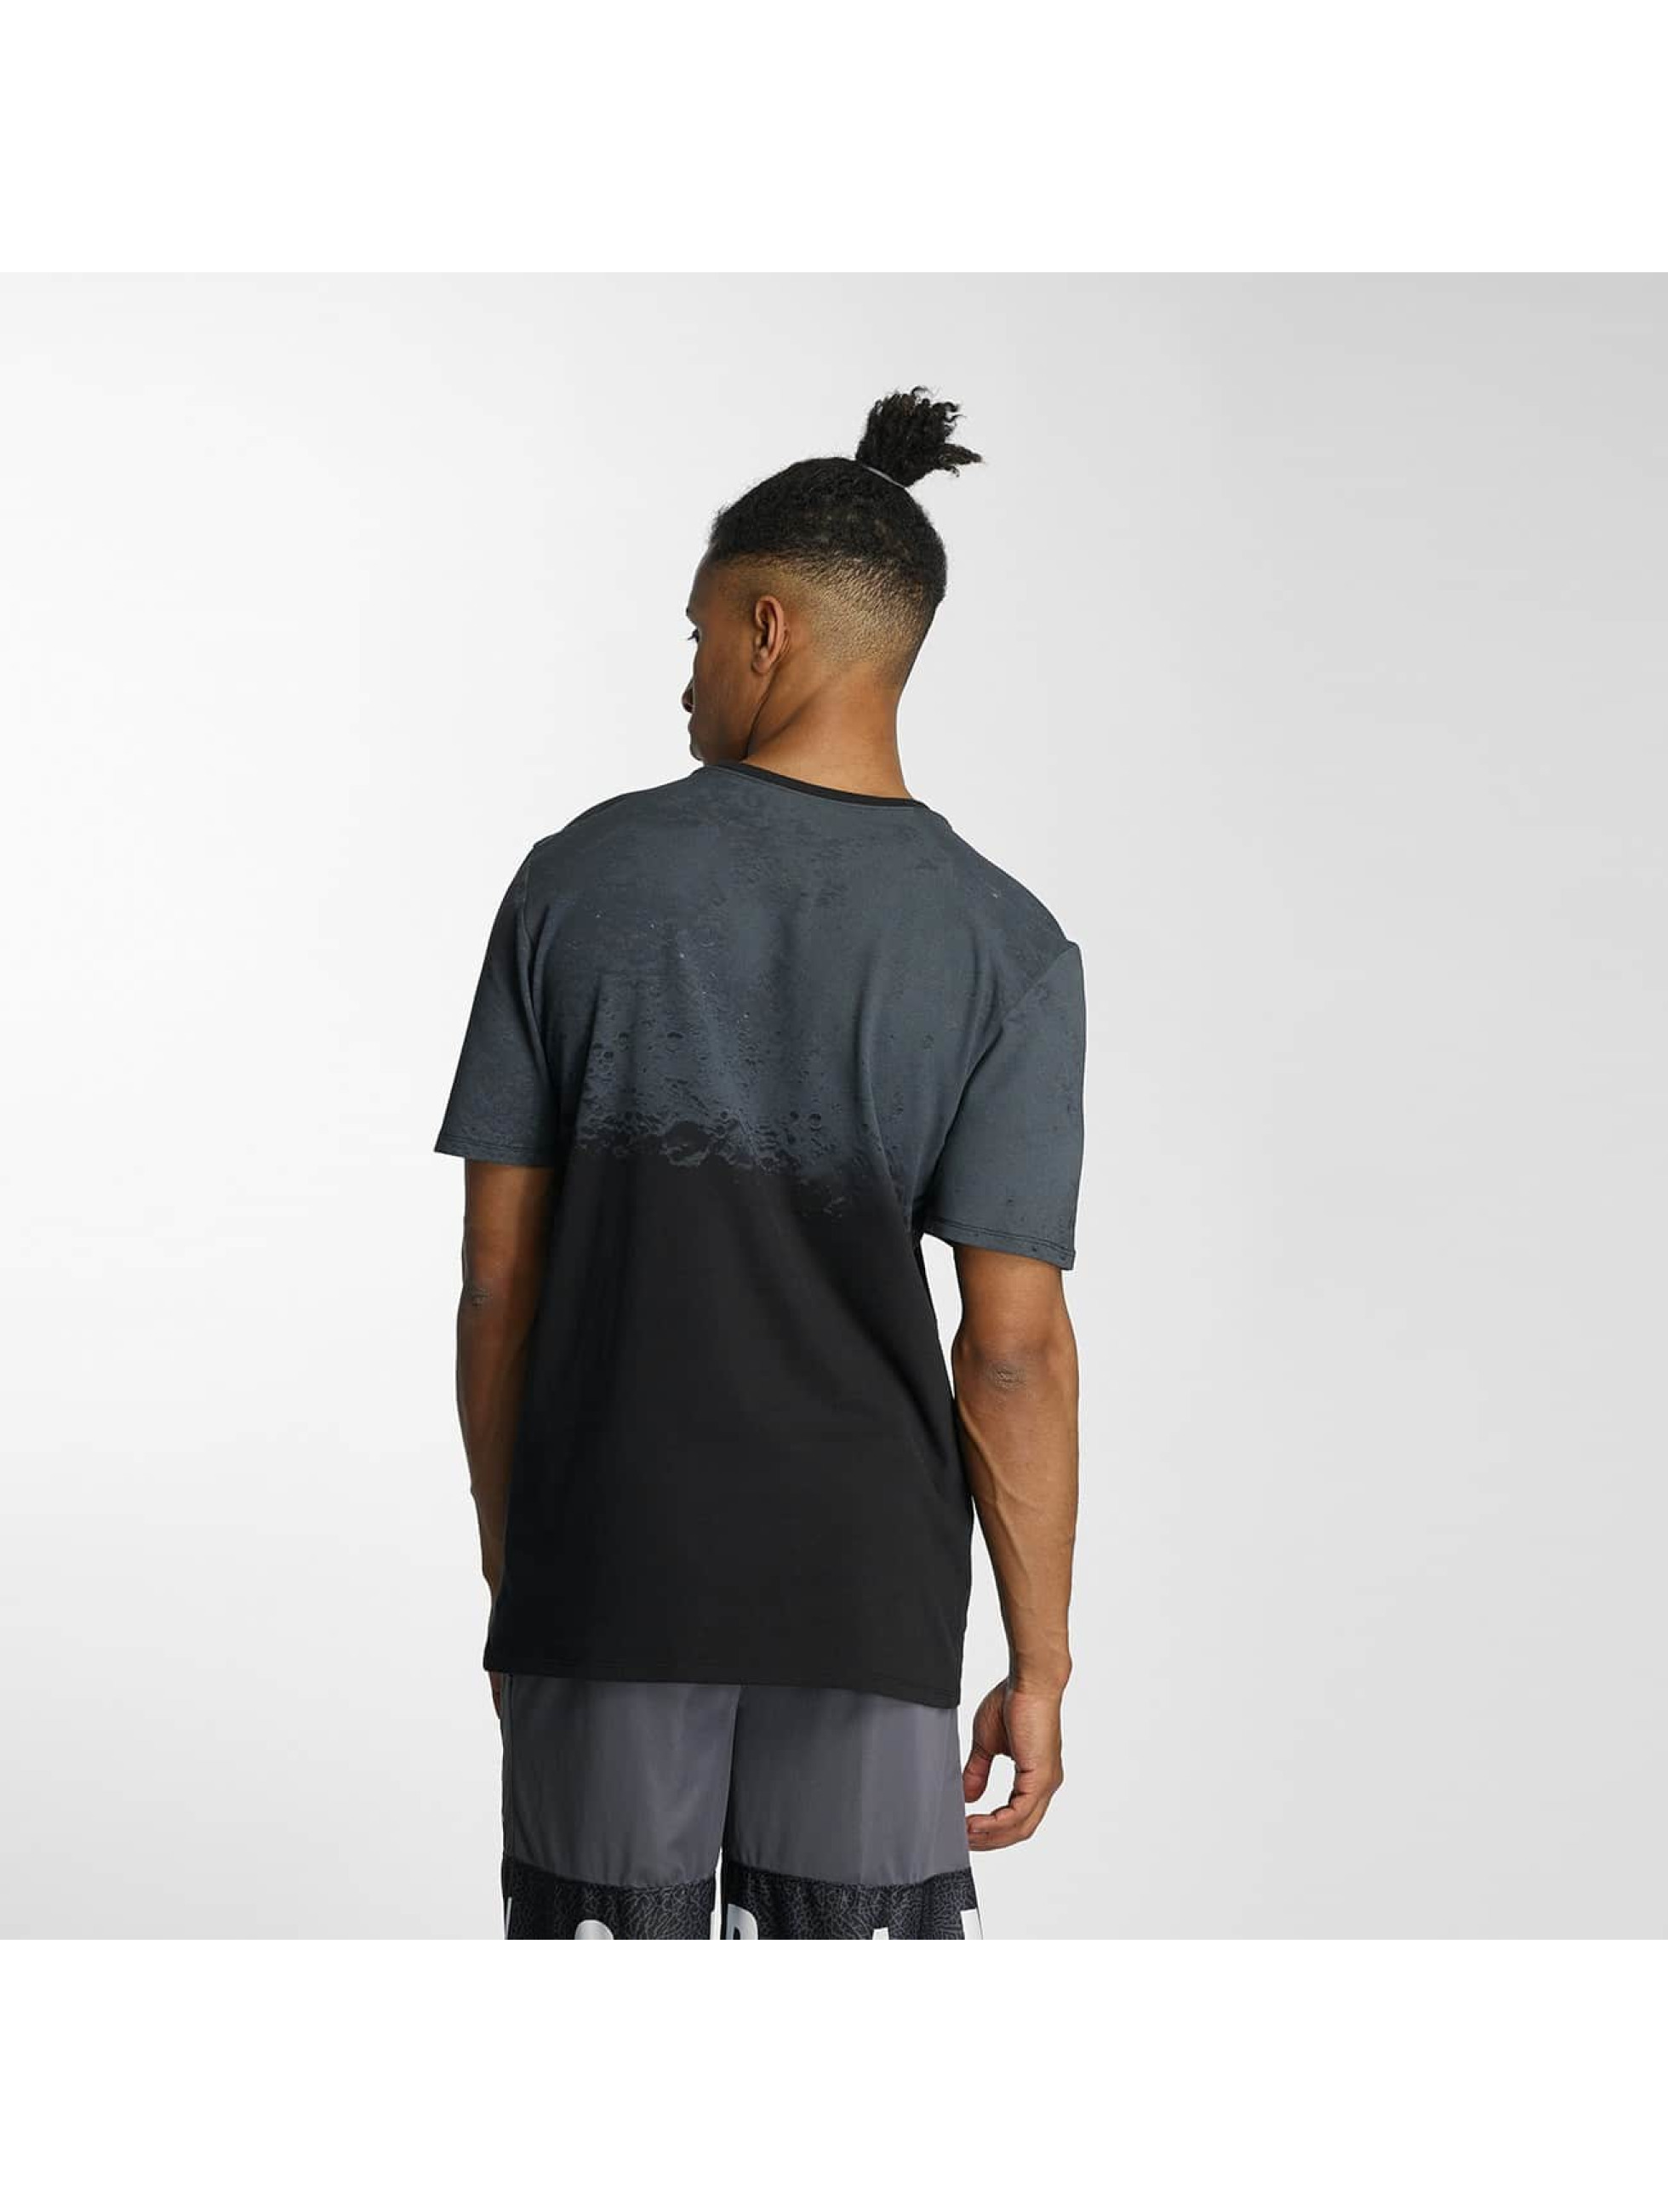 Nike T-Shirt NSW Lunar Photo black